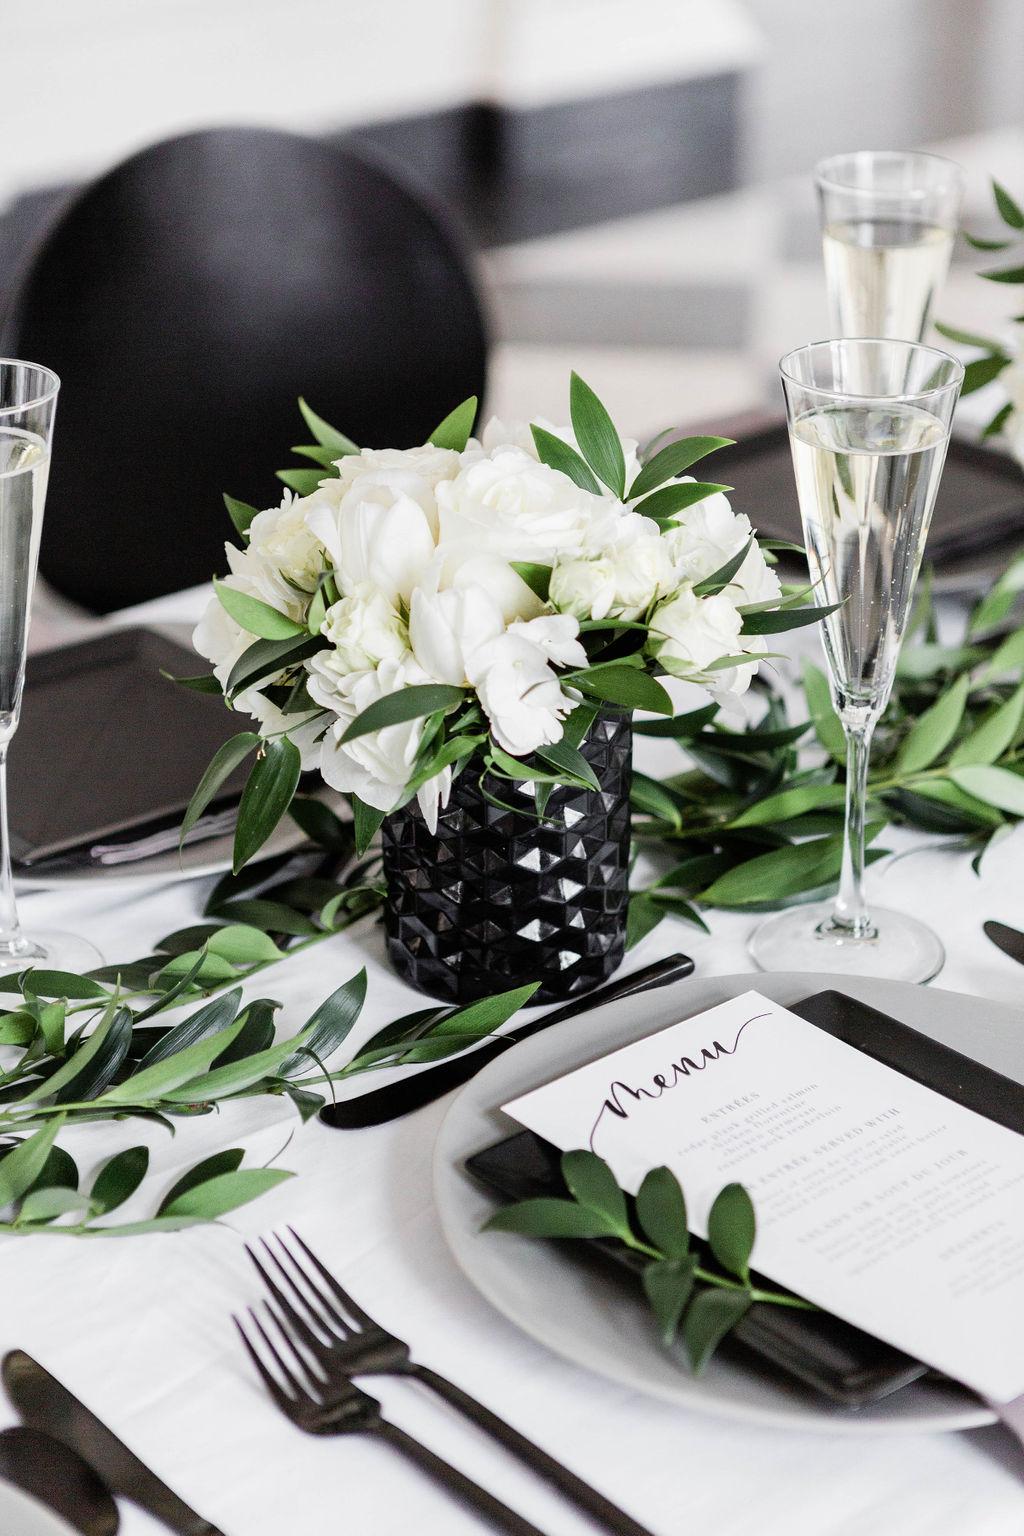 White rose centerpiece| Black Vases | Chicago History Museum | Black and White Wedding | Black Tie Wedding | Your Day by MK | Chicago Wedding Planner |